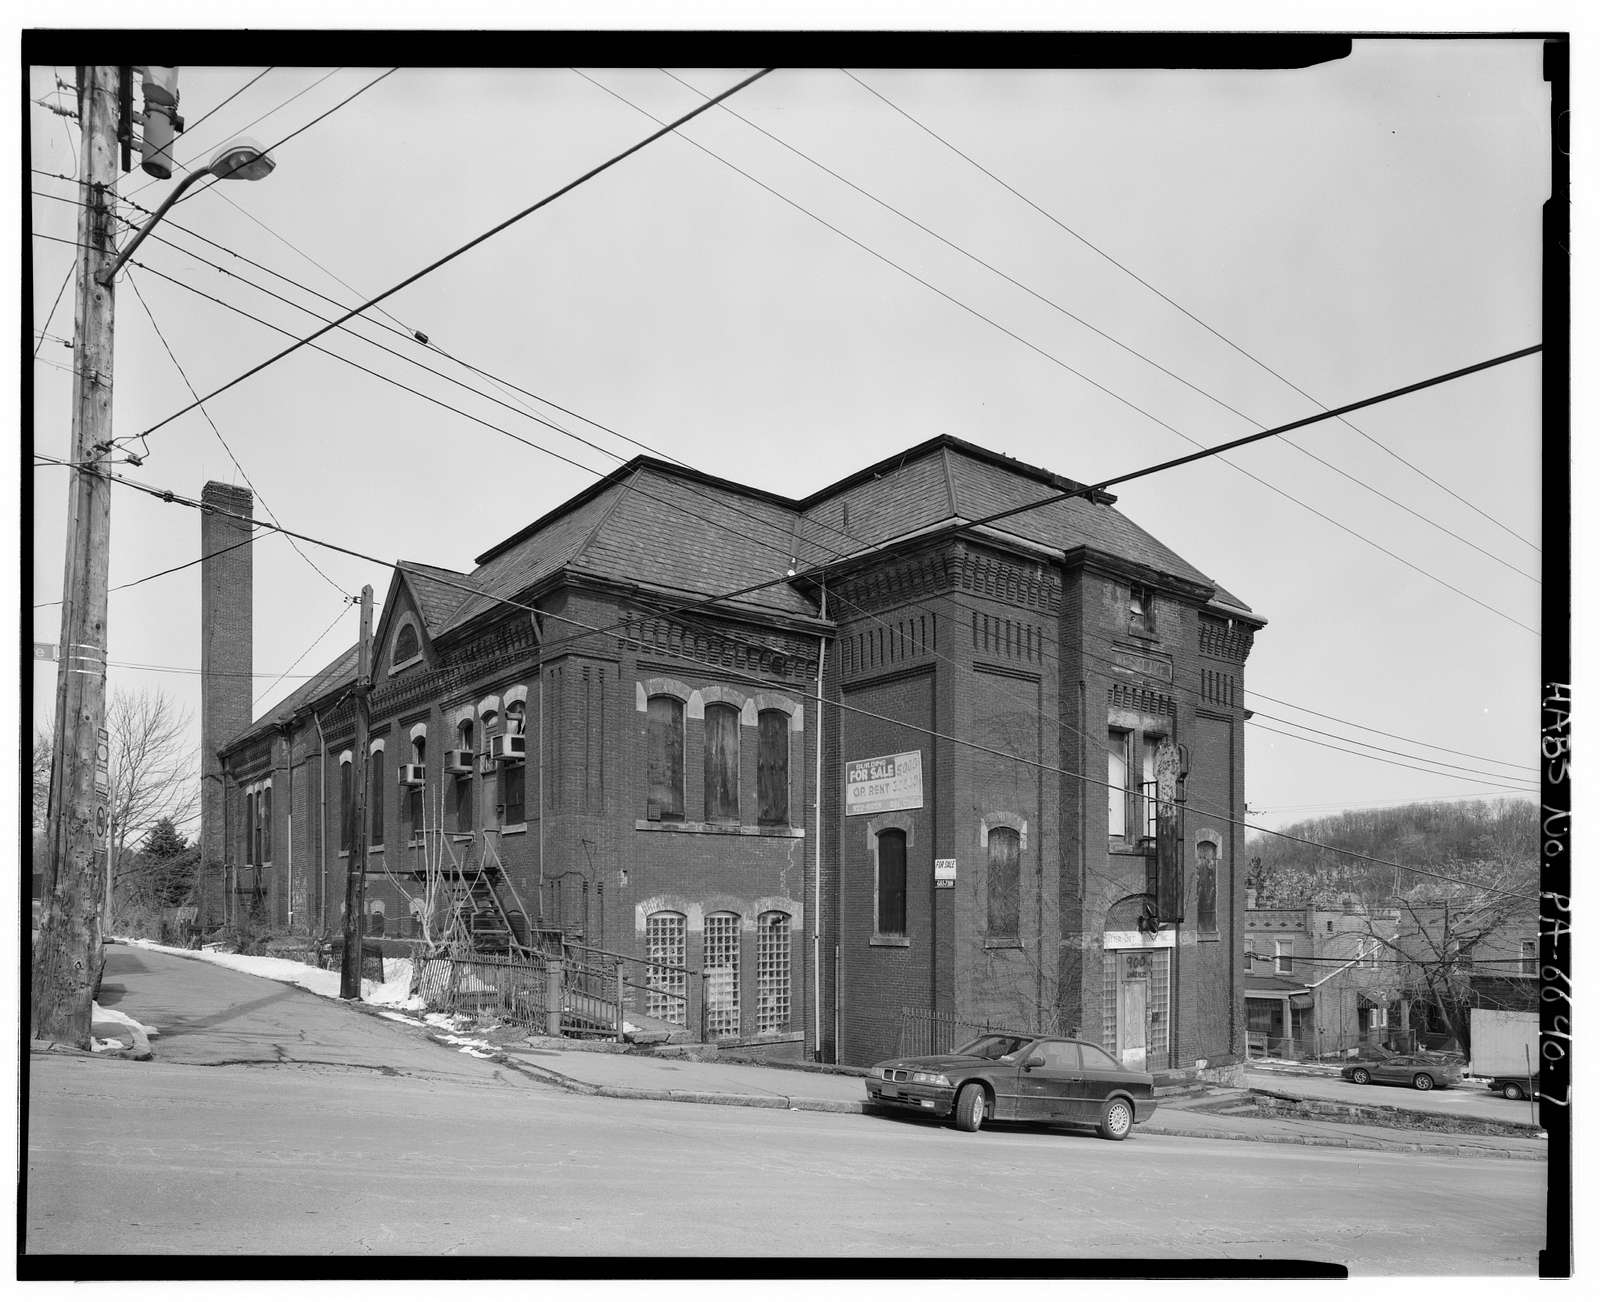 Westlake Public School, 900 Lorenz Avenue, Pittsburgh, Allegheny County, PA